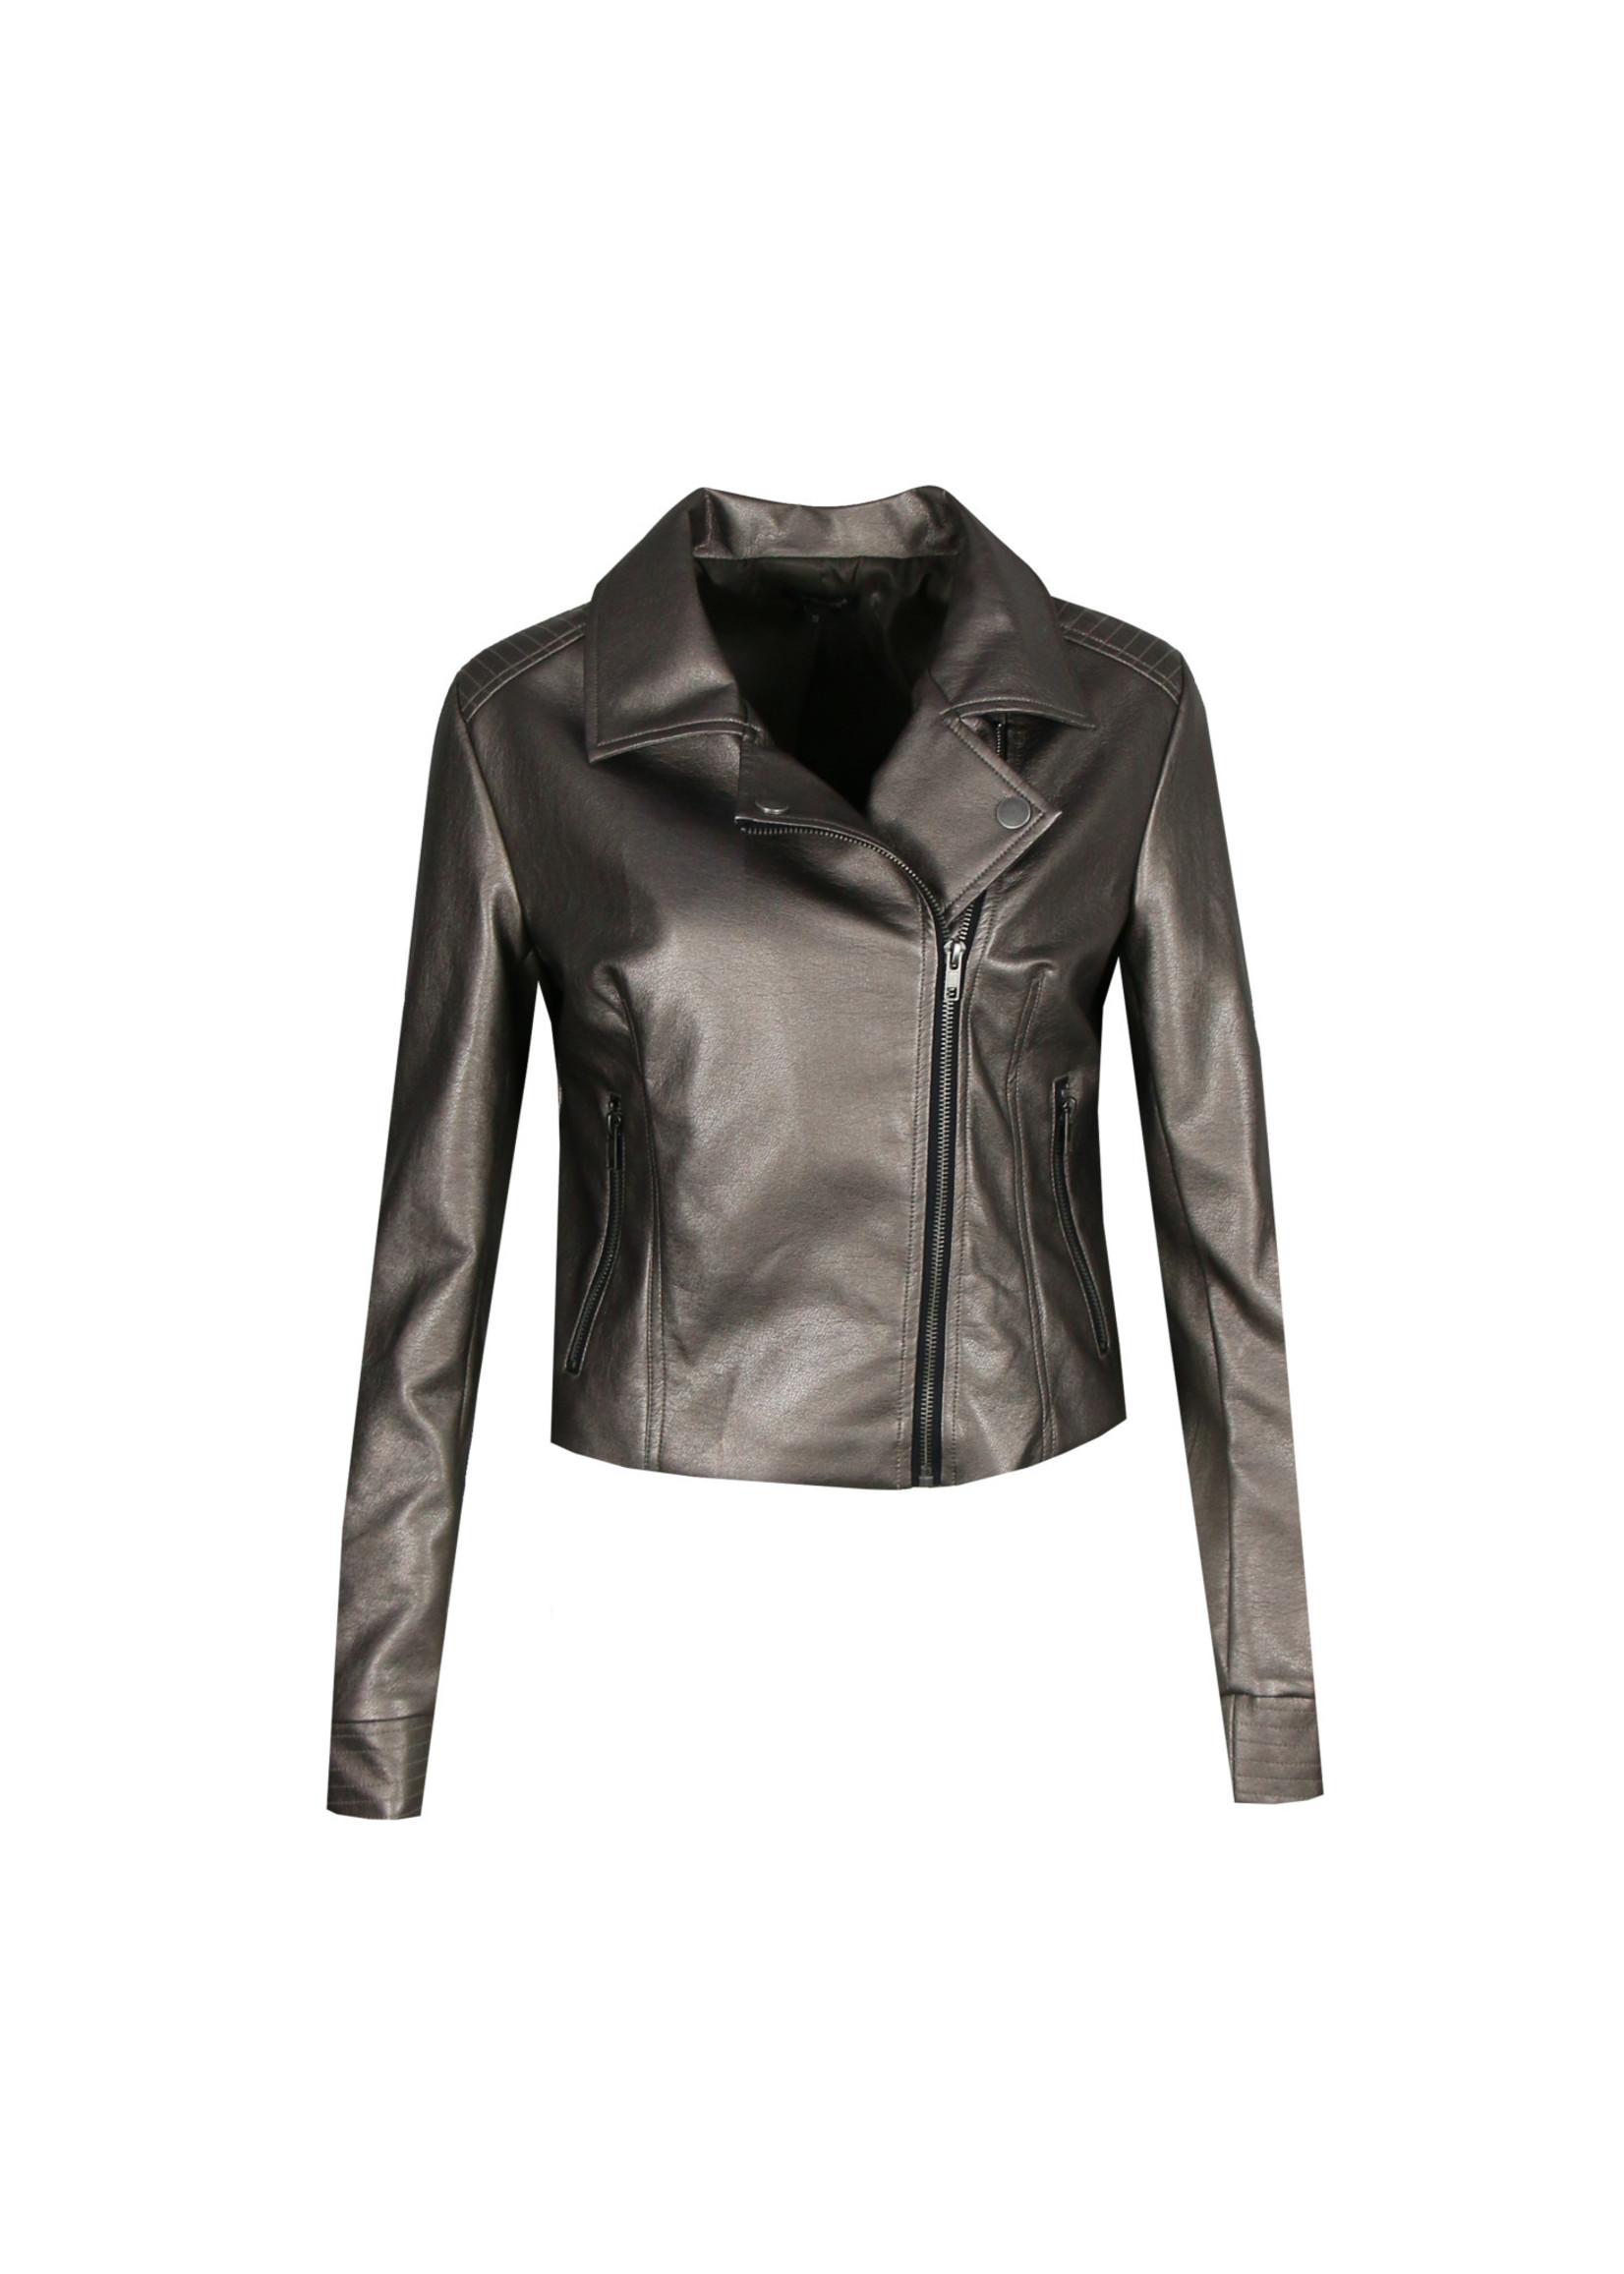 G-Maxx G-maxx - Annelies jacket - Brons